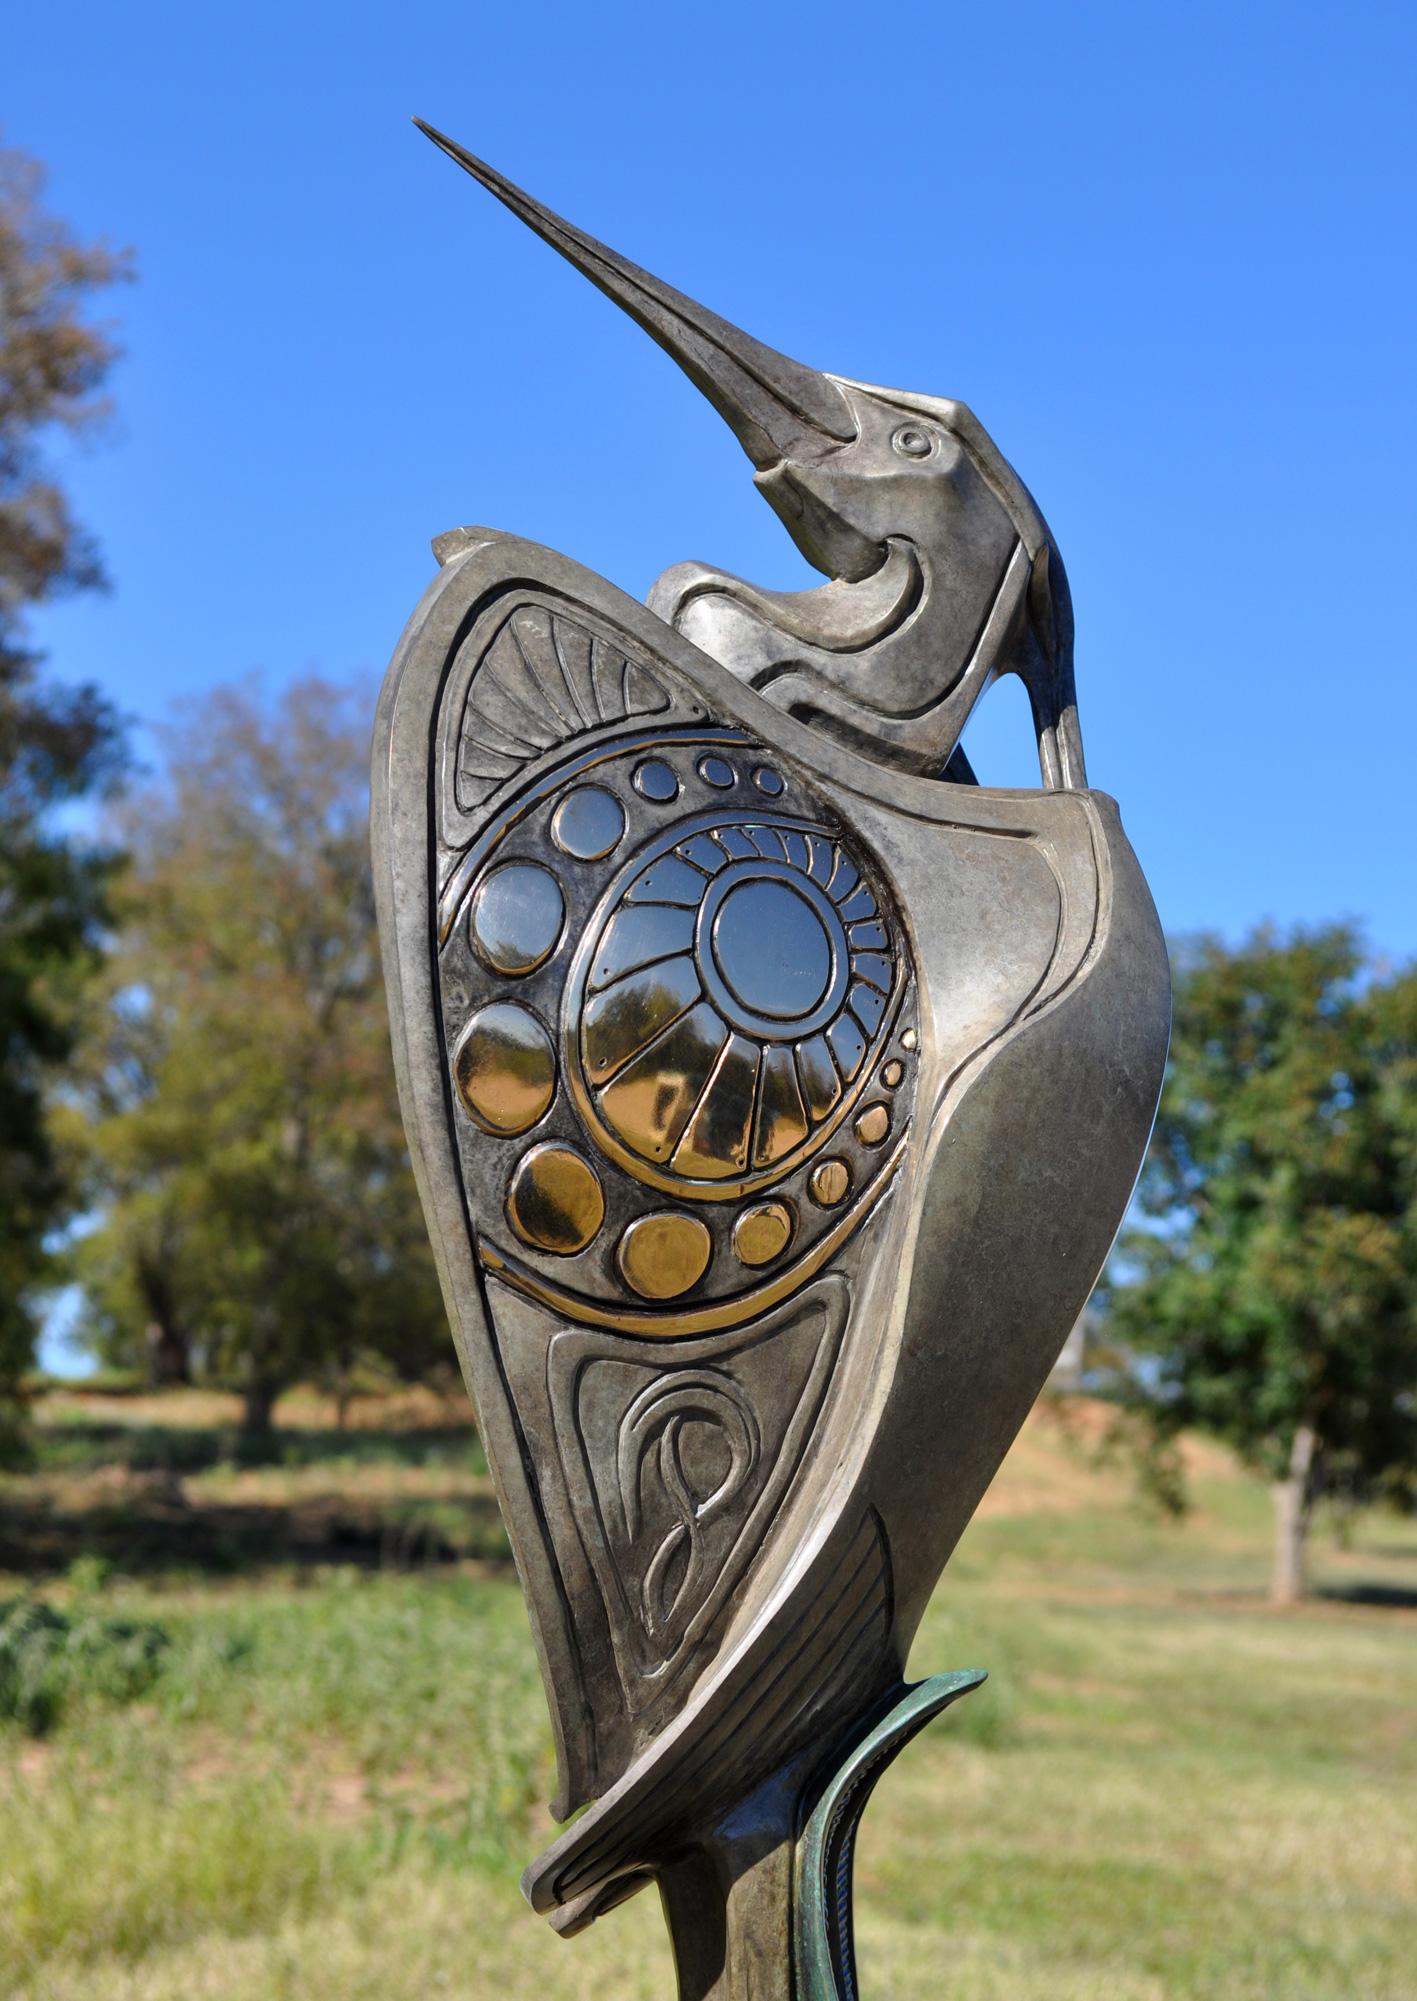 heron-bronze-sculpture-john-maisano-102.jpg